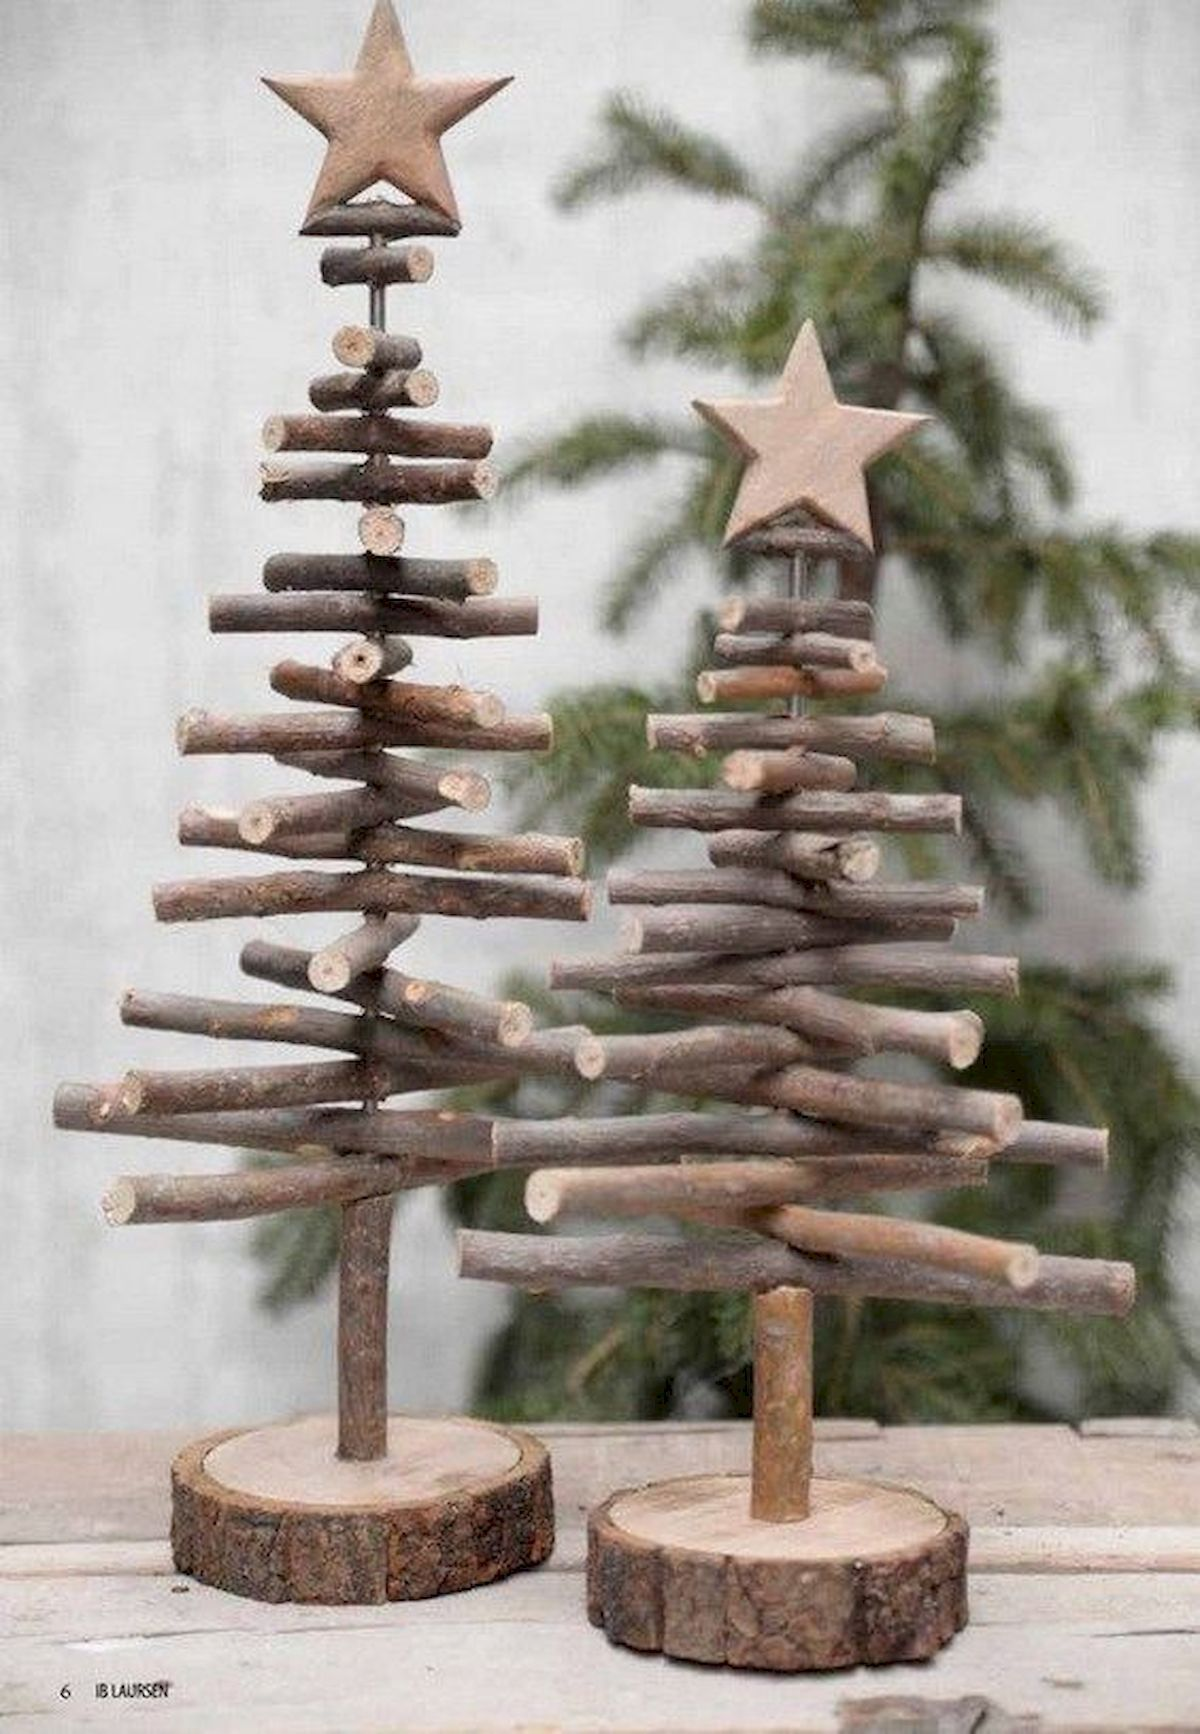 40 Stunning Rustic Christmas Decor Ideas (38) - CoachDecor.com #rusticchristmas